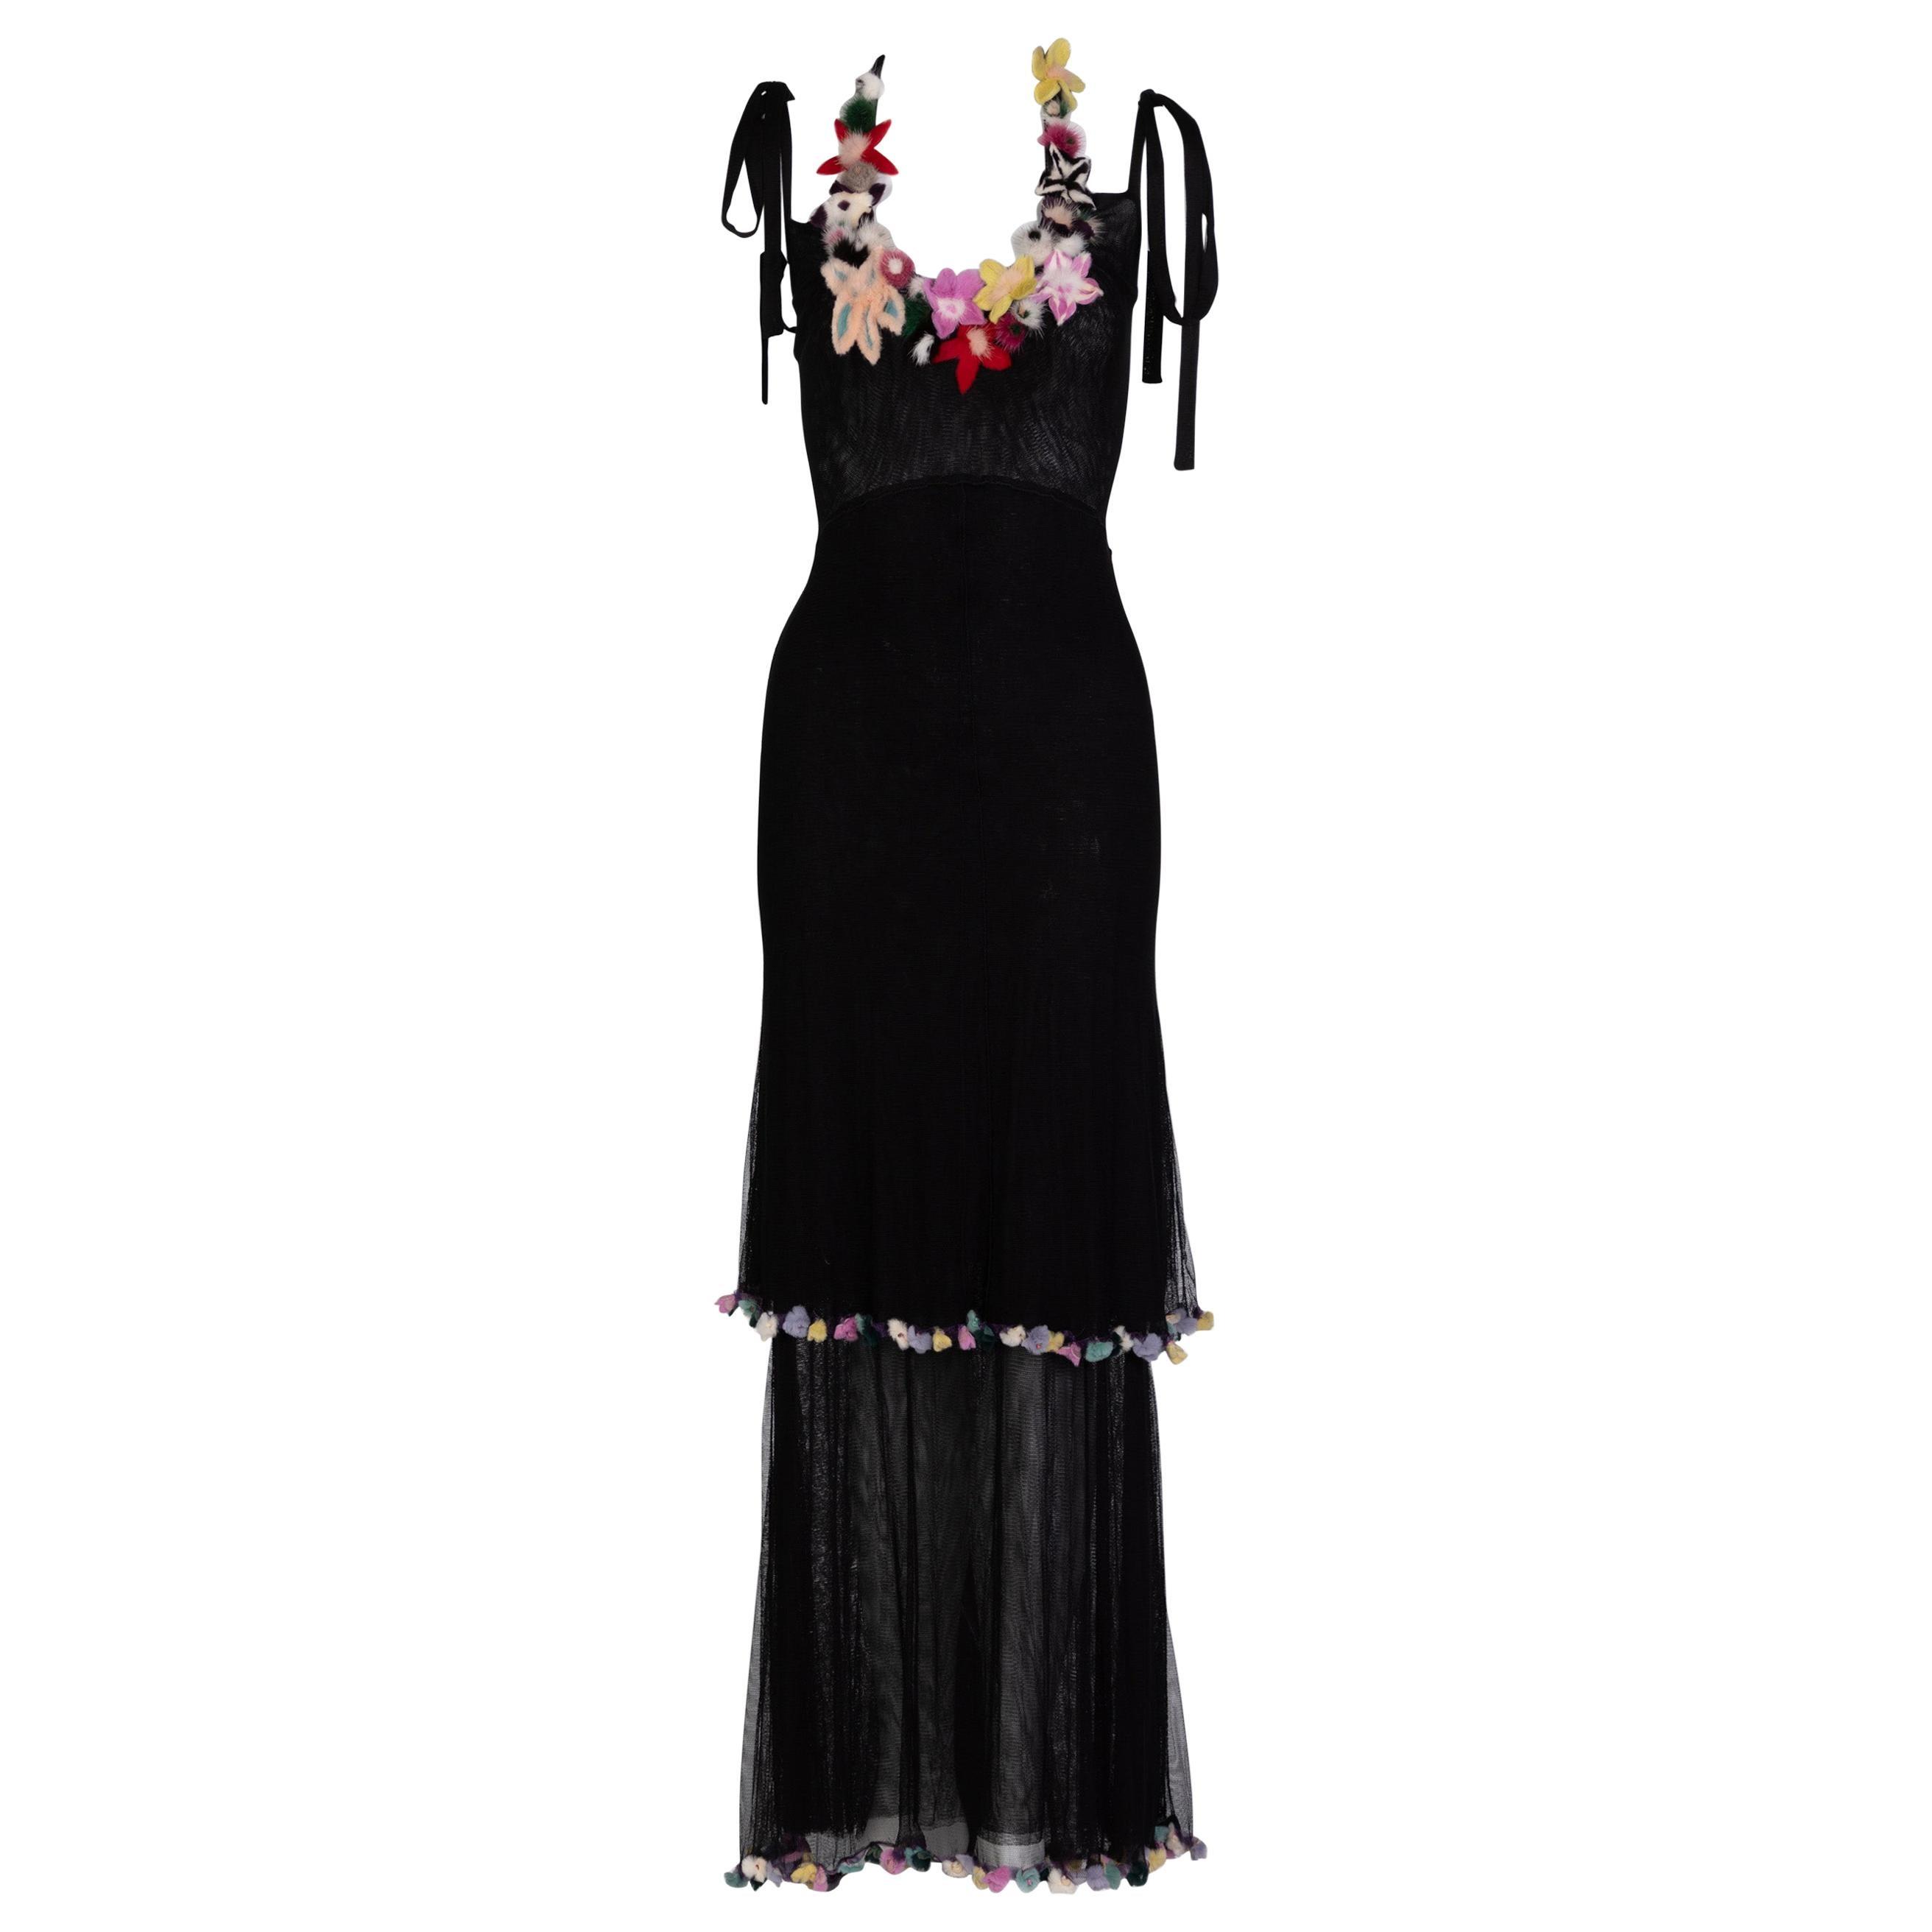 Fendi Black Silk Mesh Tiered Hourglass Fur Floral Applique Maxi Dress